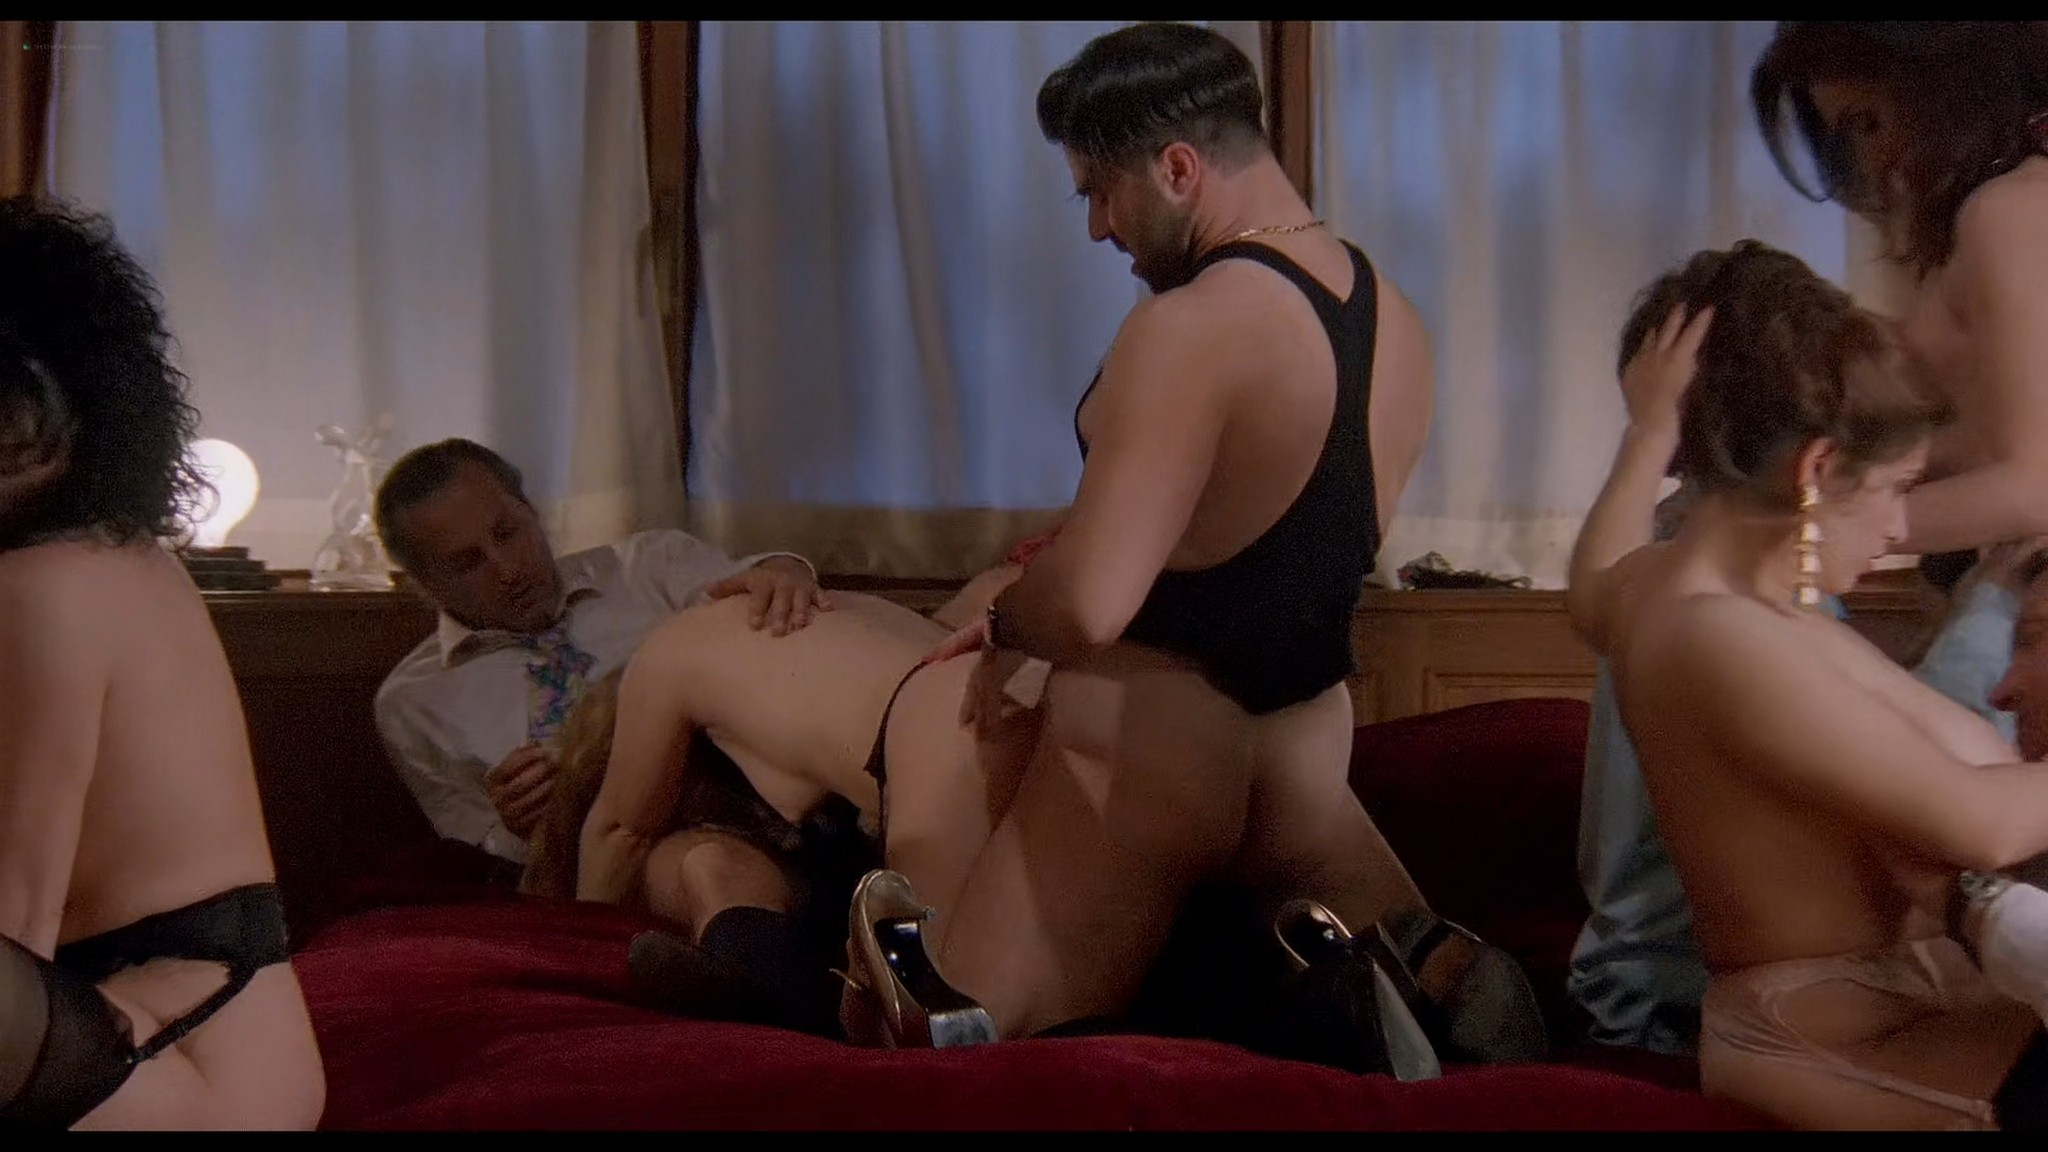 Cinzia Roccaforte nude explicit Erika Savastani and other nude sex explicit Fermo posta Tinto Brass 1995 HD 1080p BluRay 015